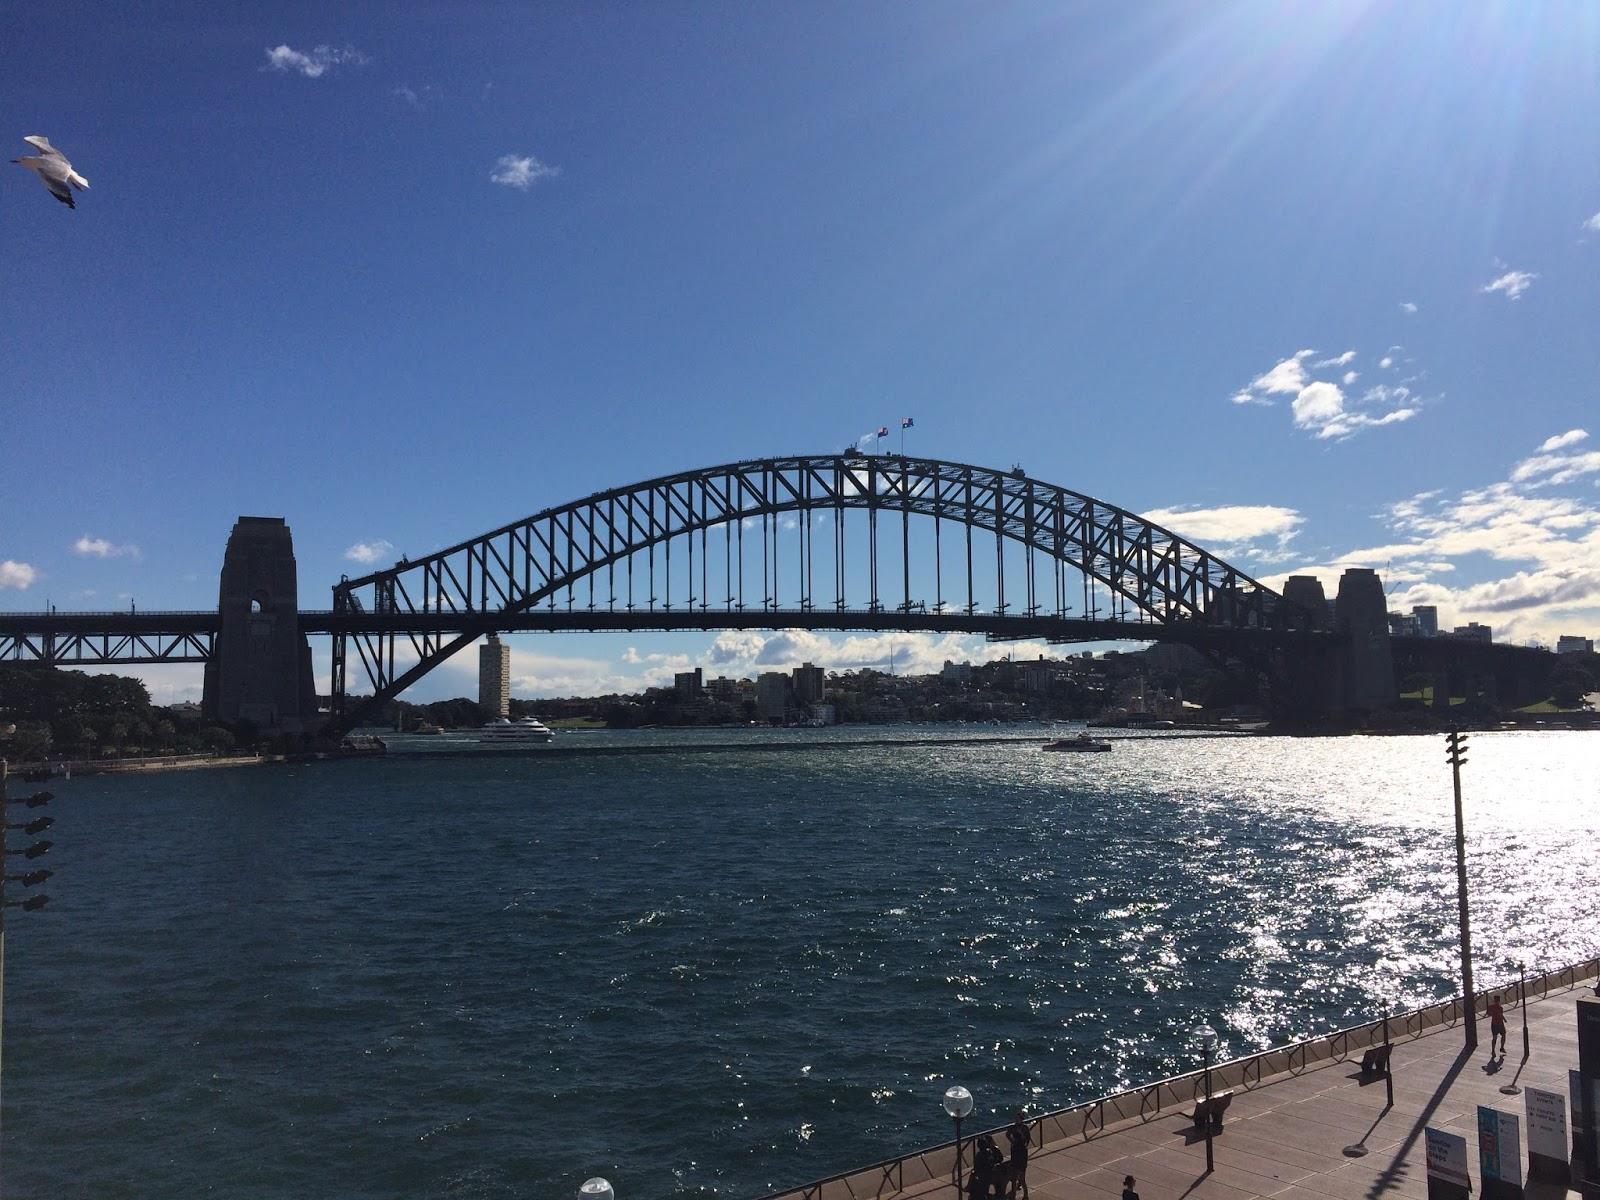 HDA lOpéra de Sydney by Etienne LE GALL on Prezi